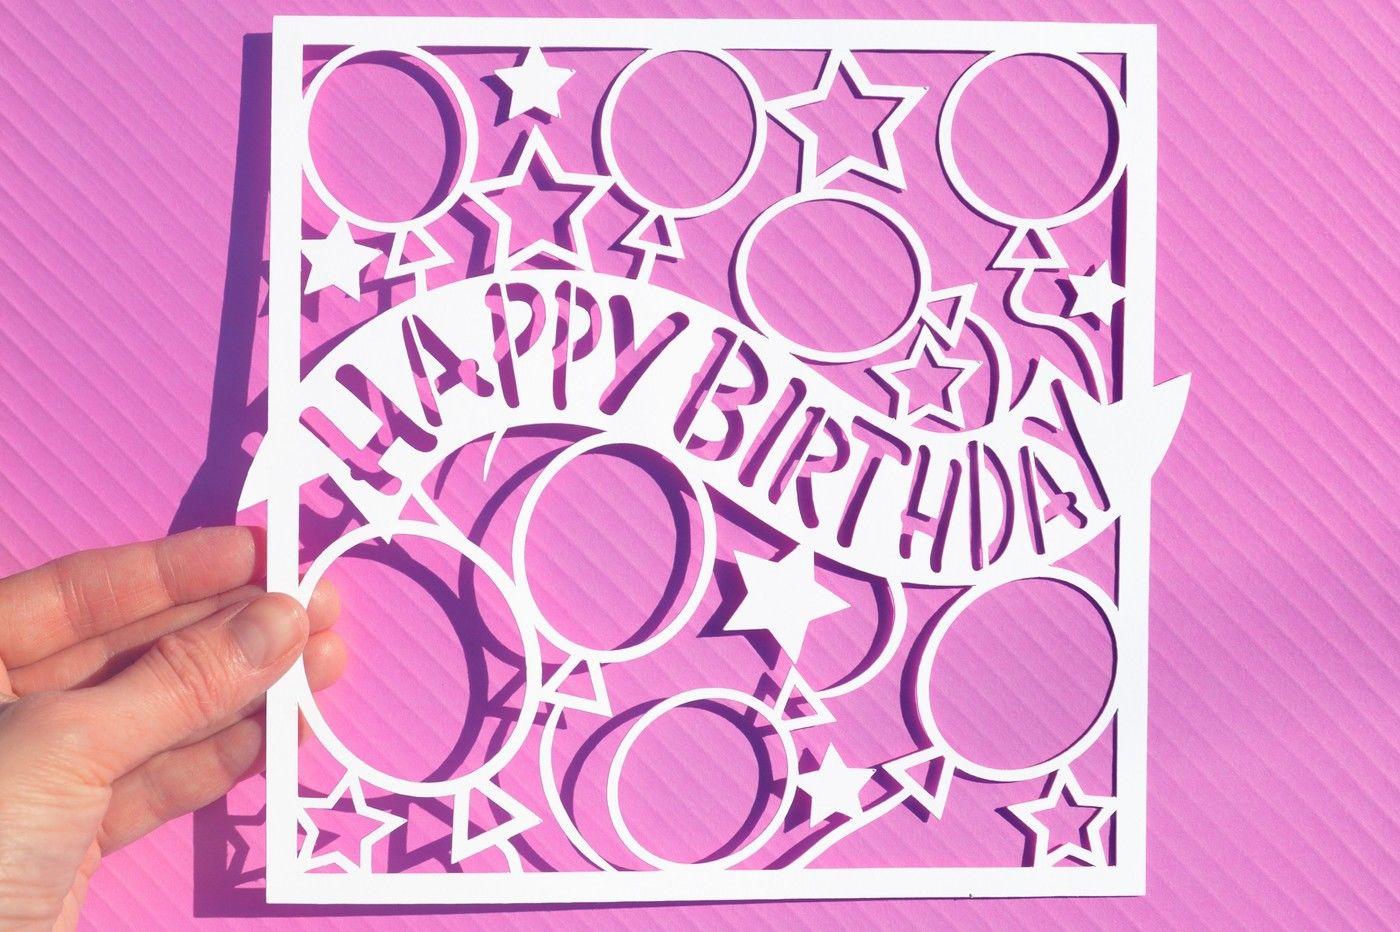 Happy Birthday Svg Dxf Eps Files By Digital Gems Thehungryjpeg Com